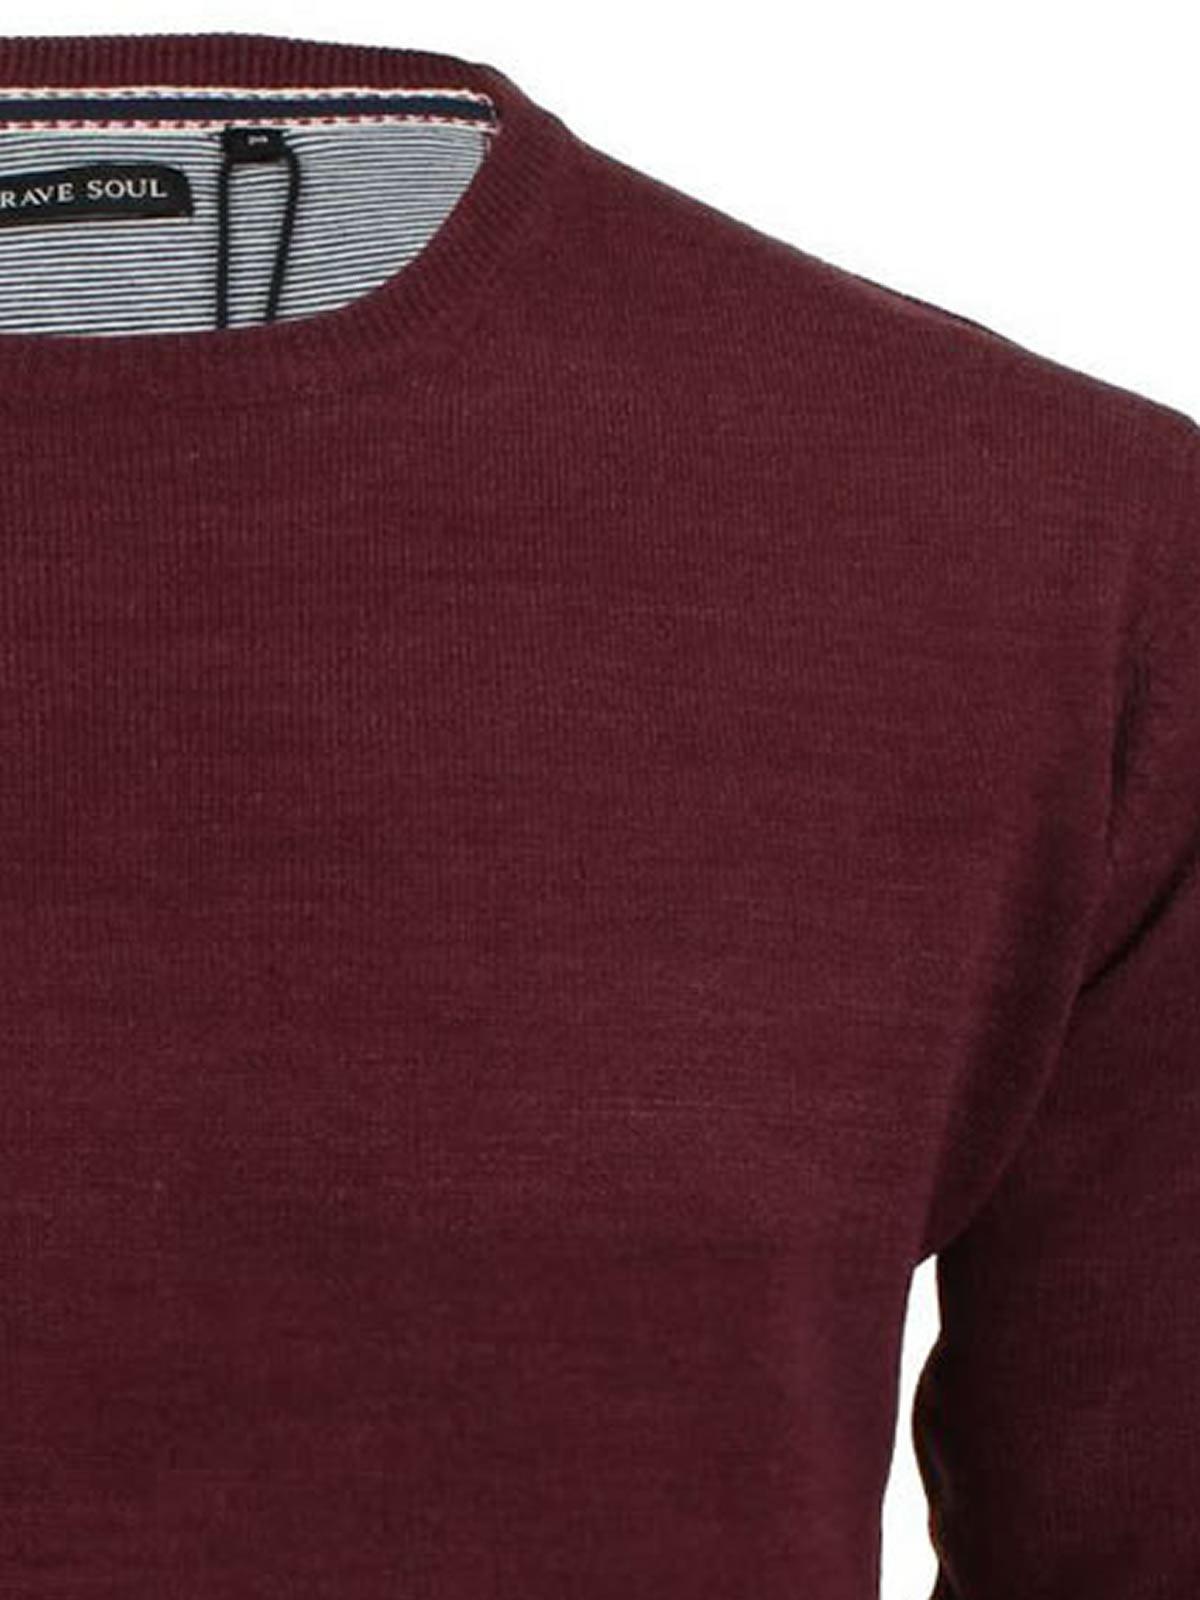 Mens-Jumper-Brave-Soul-Urbain-Knitted-Crew-Neck-Sweater thumbnail 28